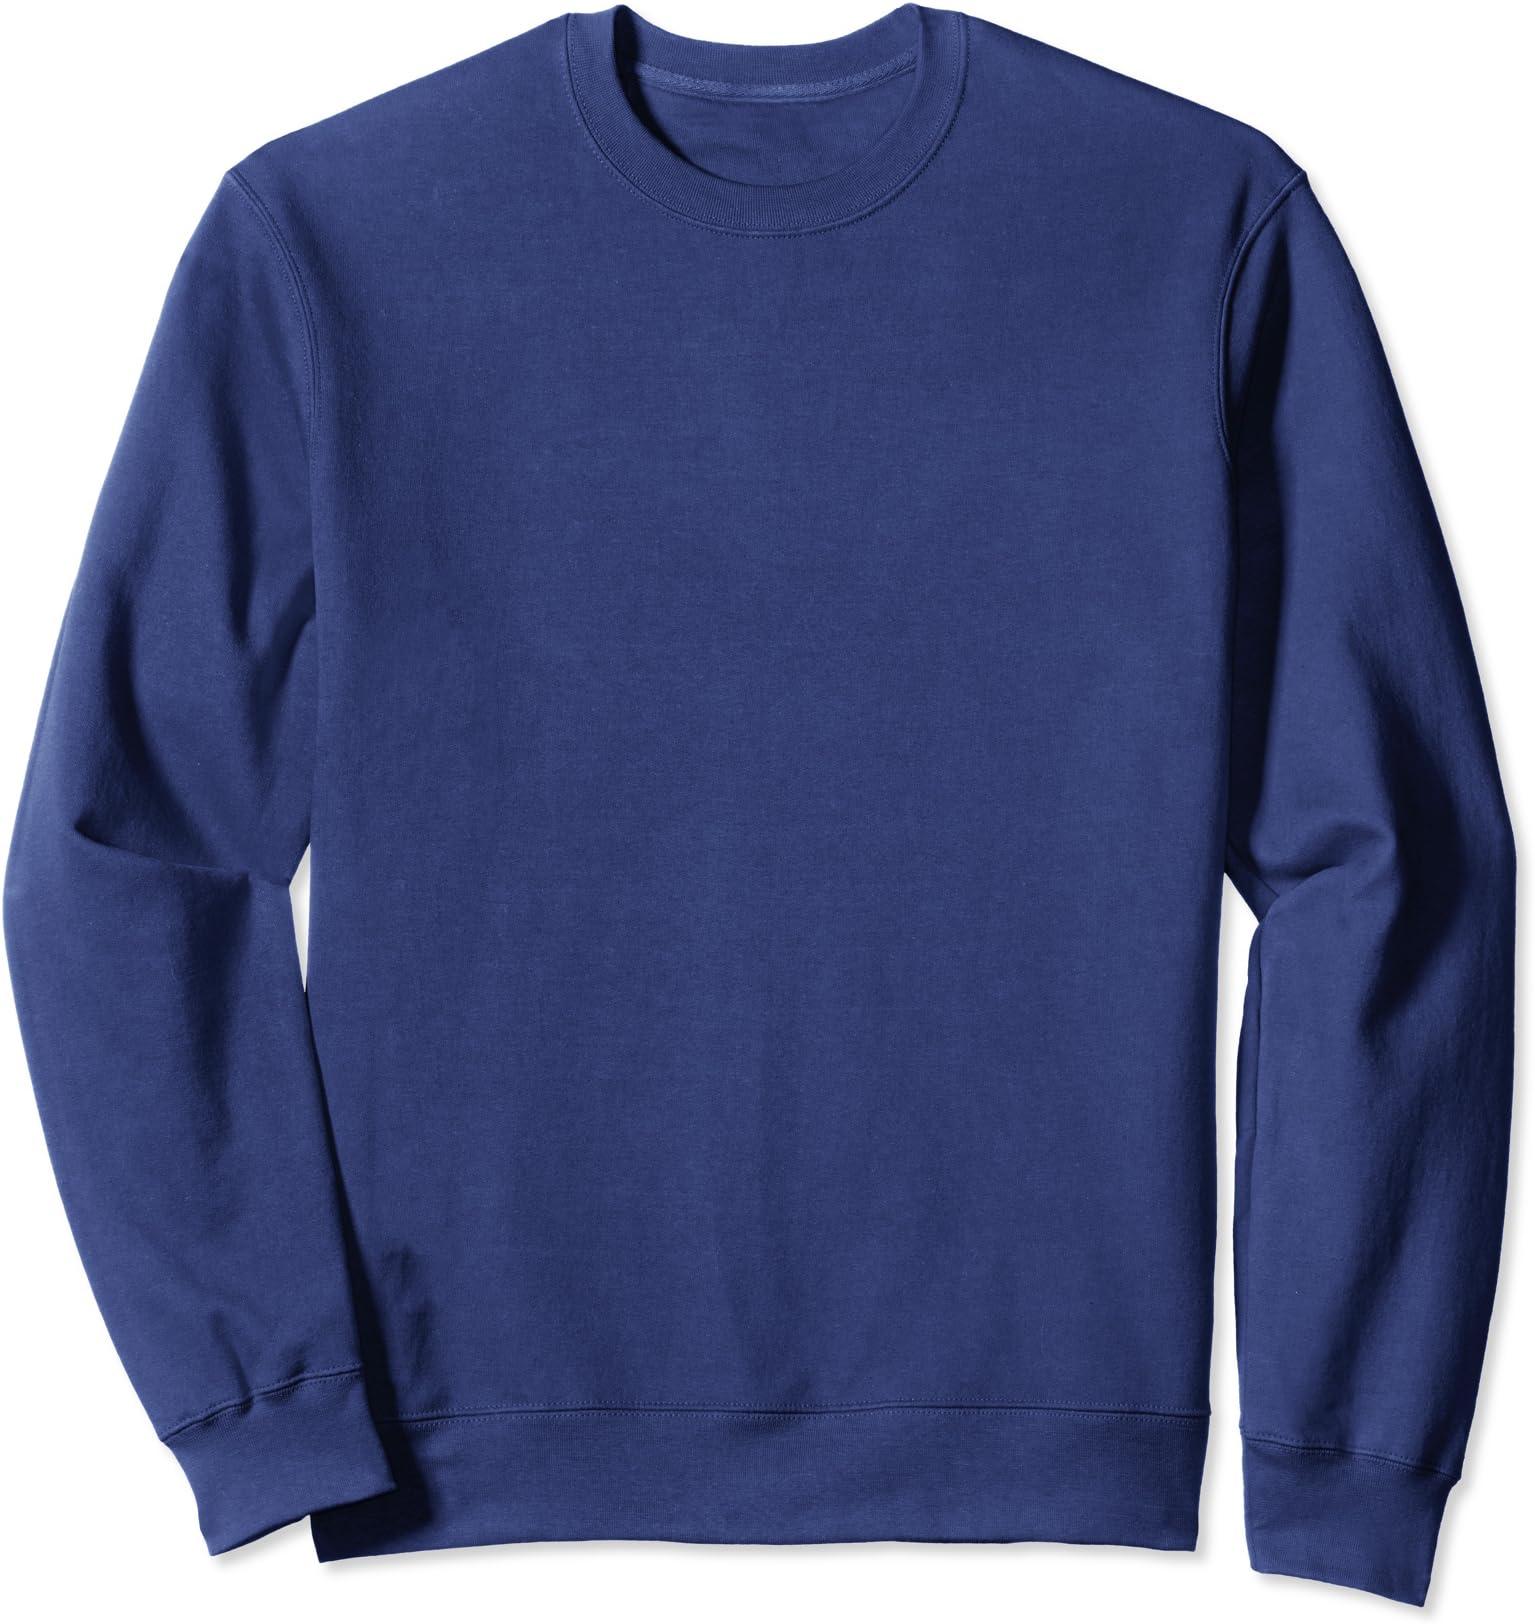 Creighton University Game Day Crewneck Pullover Sweatshirt Sweater